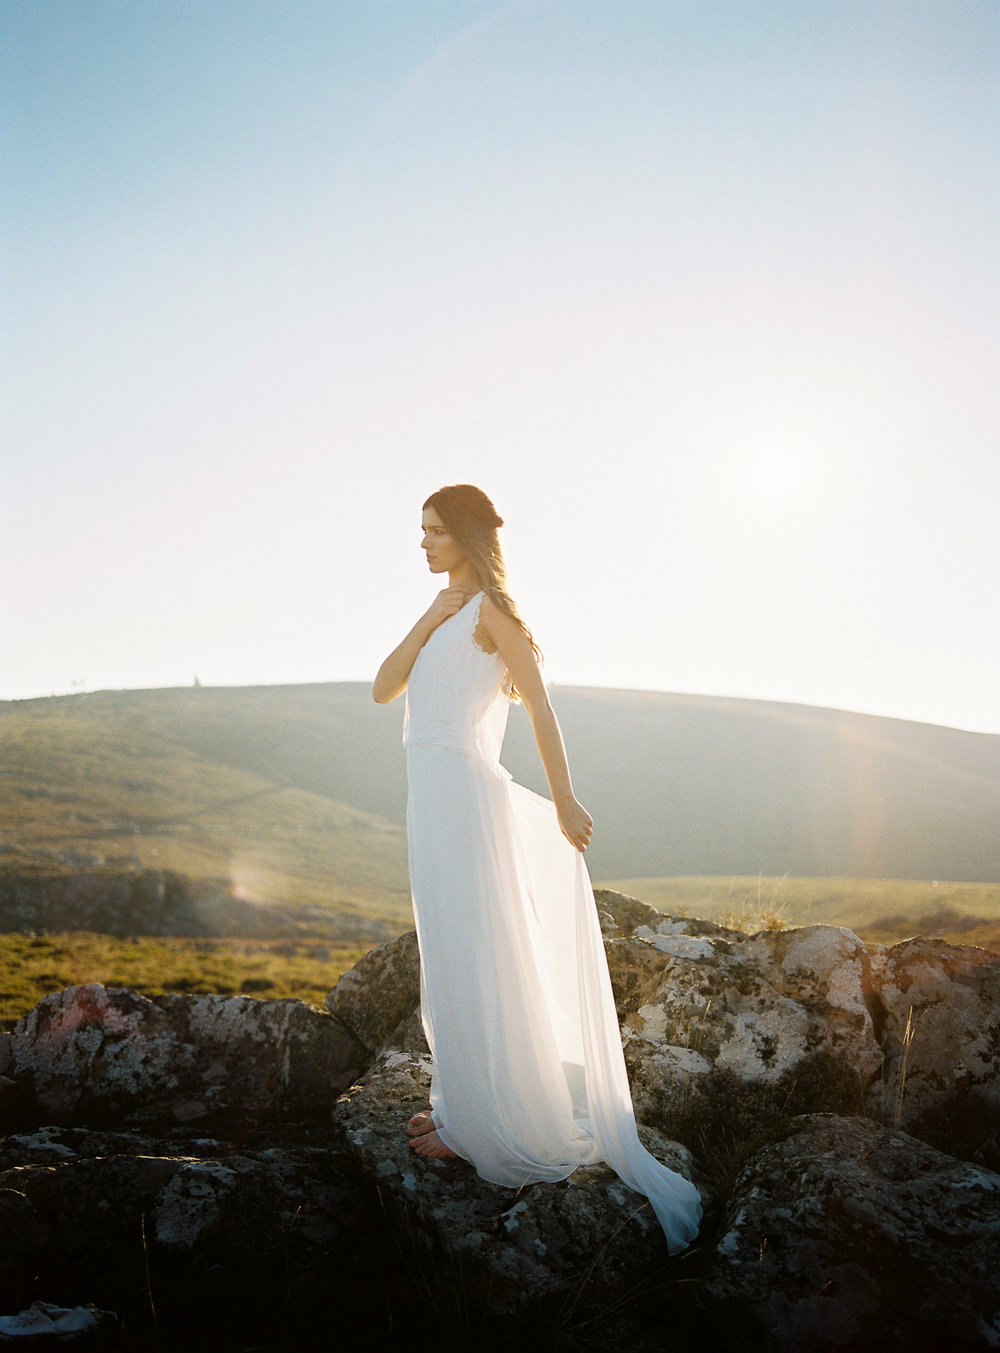 Bohemian Wedding Dress - Rembo Styling - ©Celine Chhuon